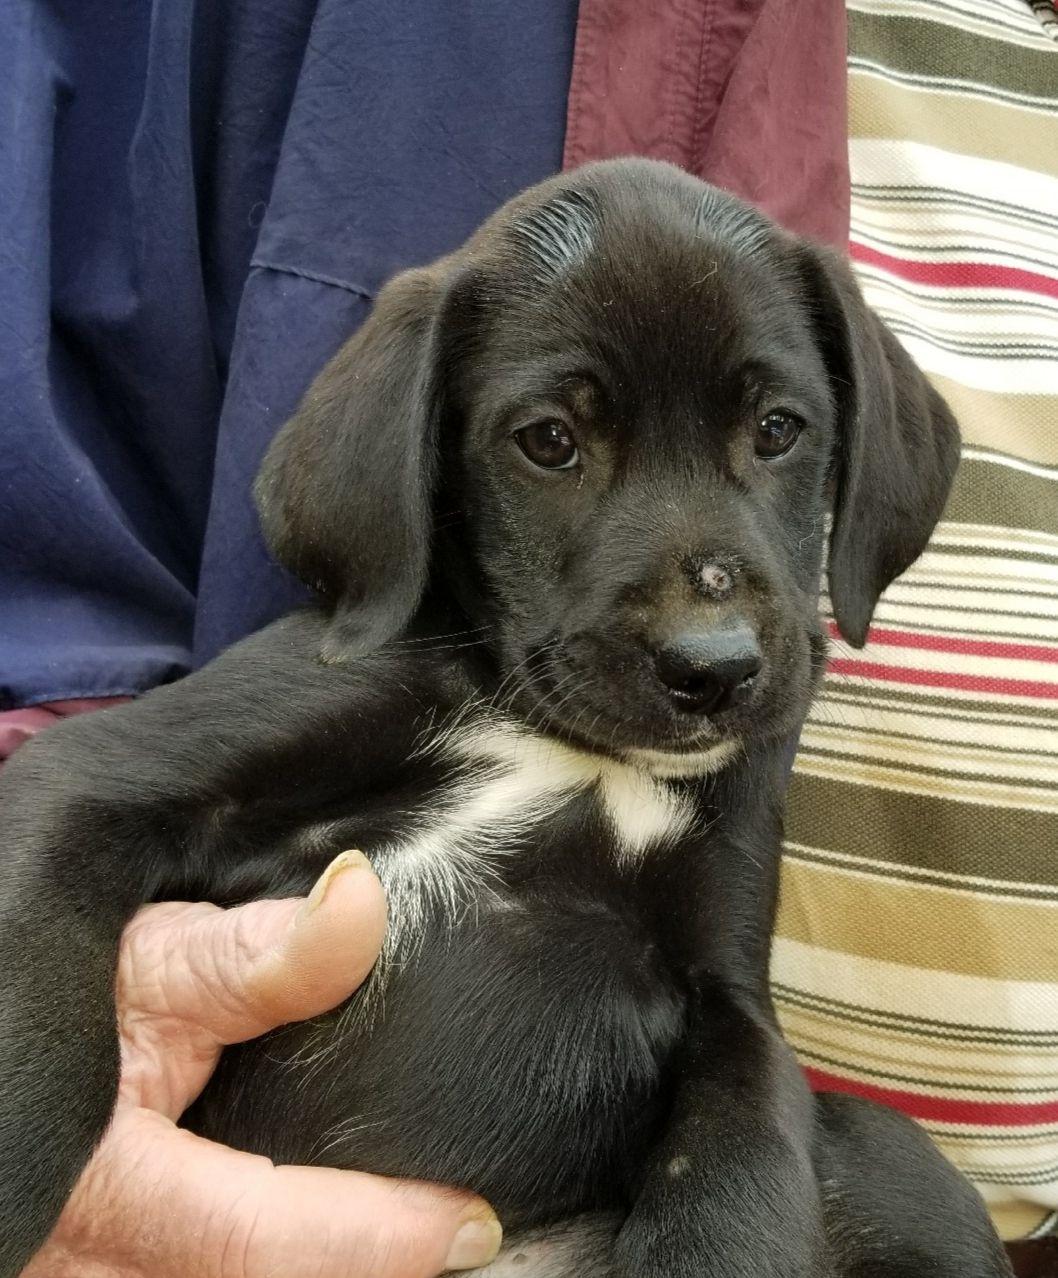 Pointer Dog For Adoption In Morganville Nj Adn 754262 On Puppyfinder Com Gender Male Age Baby Dog Adoption Pointer Dog Dogs